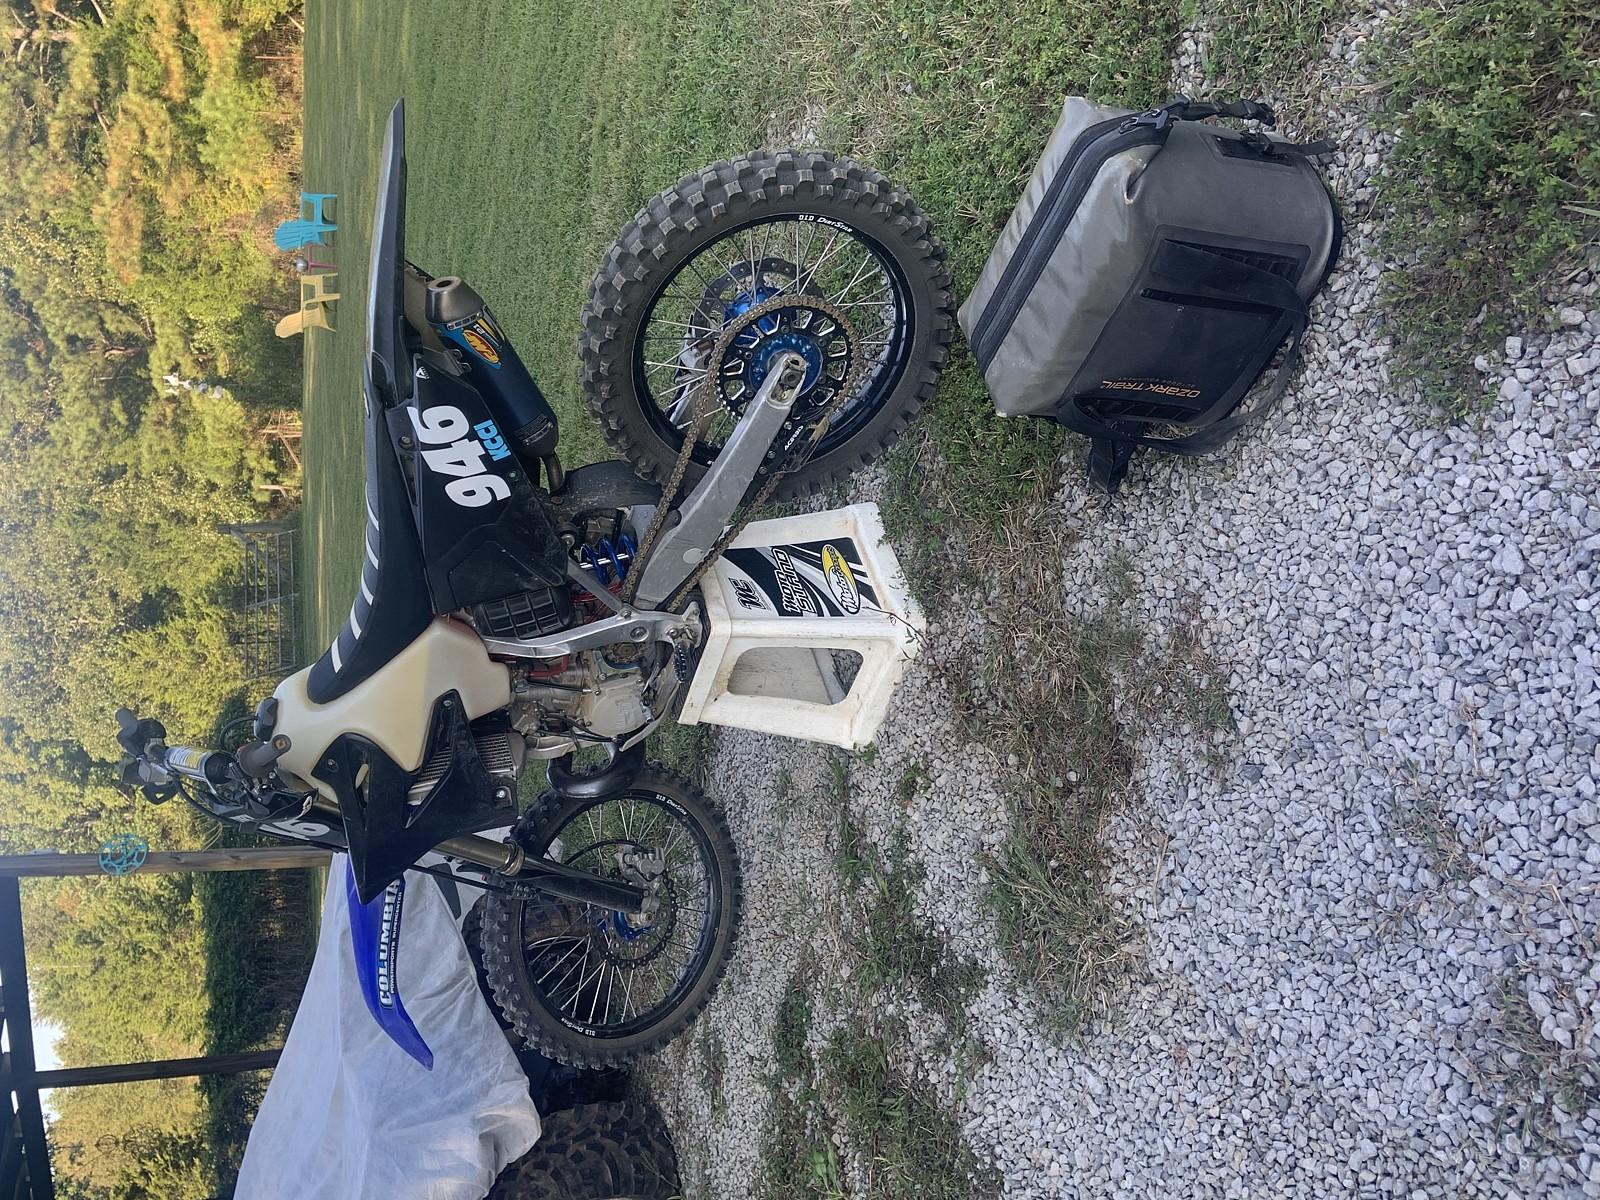 7809CA79-9AA9-4CDD-975E-517A5E1DDE5F - ianhendry46 - Motocross Pictures - Vital MX